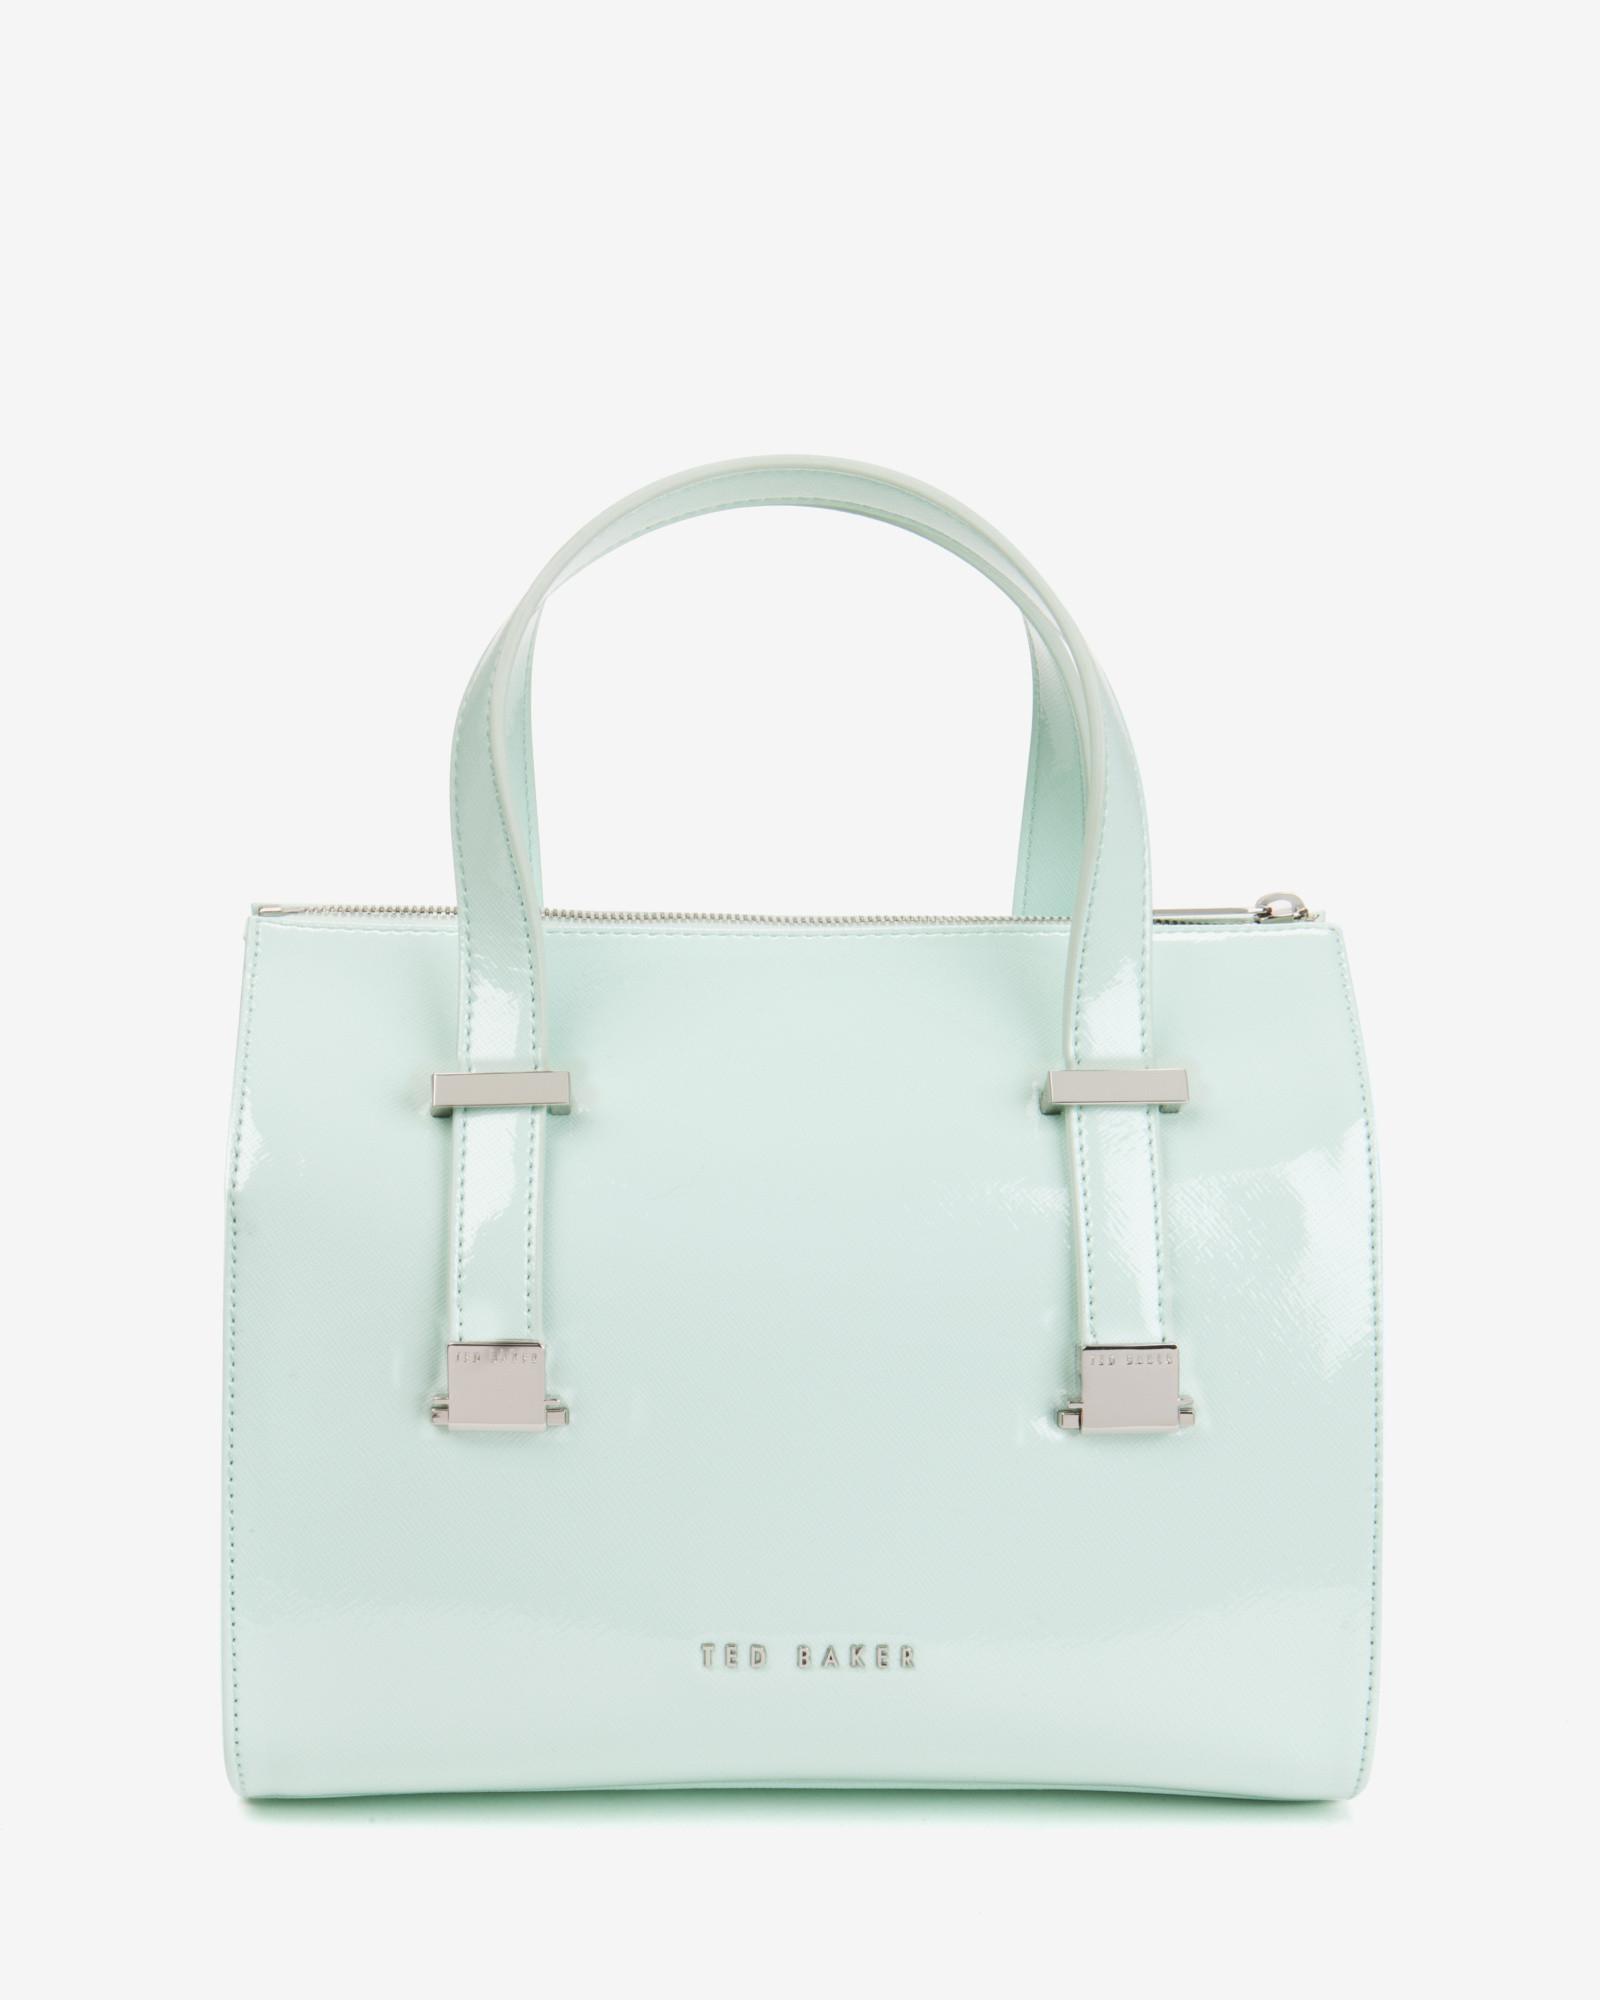 Ted Baker Crosshatch Bowler Bag in Mint (Green)